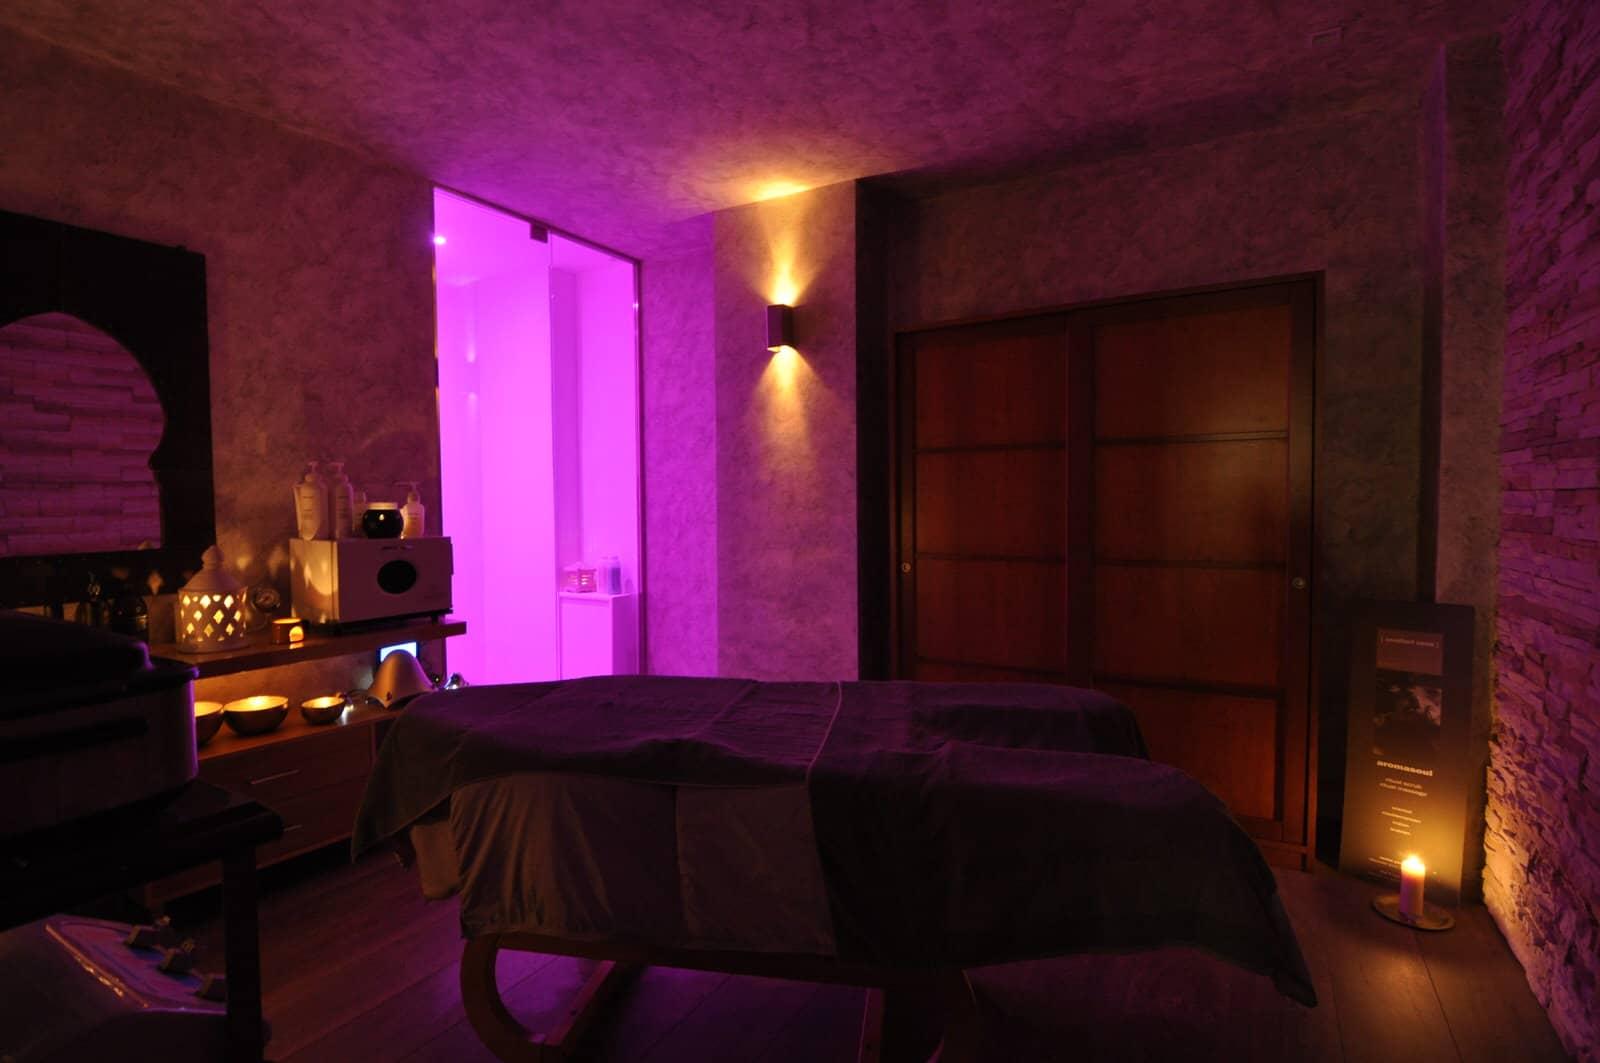 Centro estetico Anna Mari - Relax room